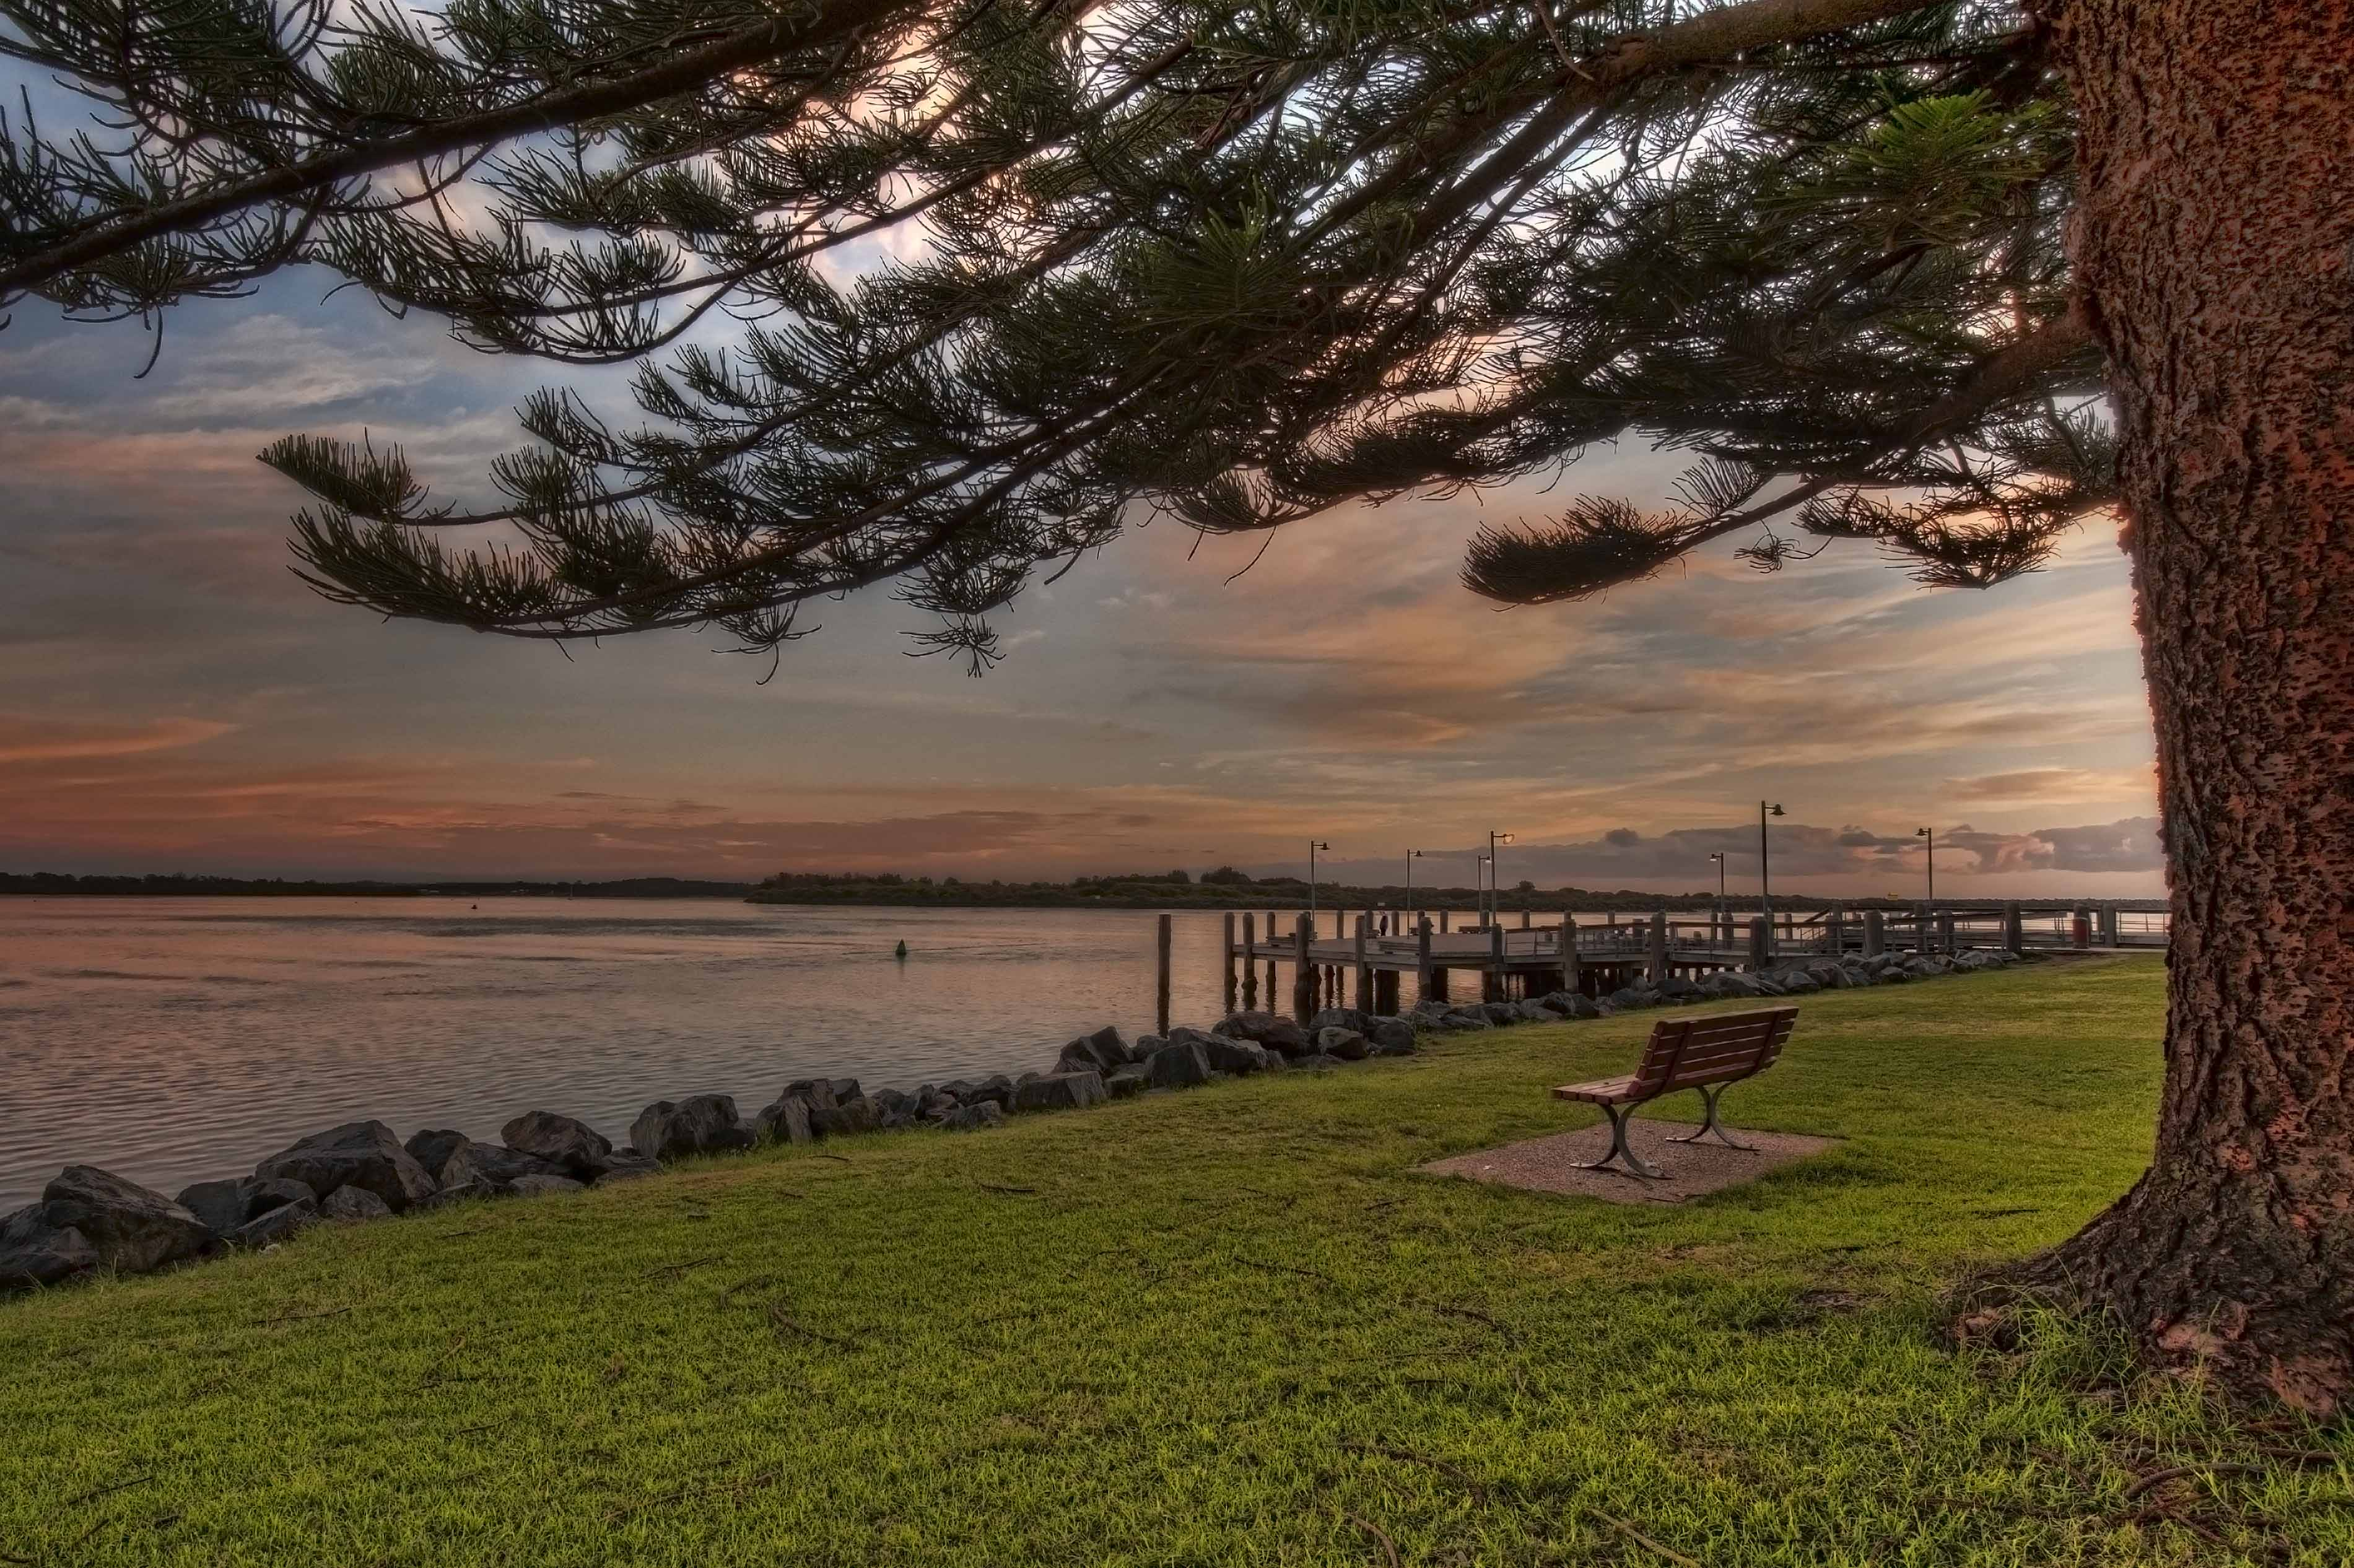 Sunrise seat in Port Macquarie HDR Photo